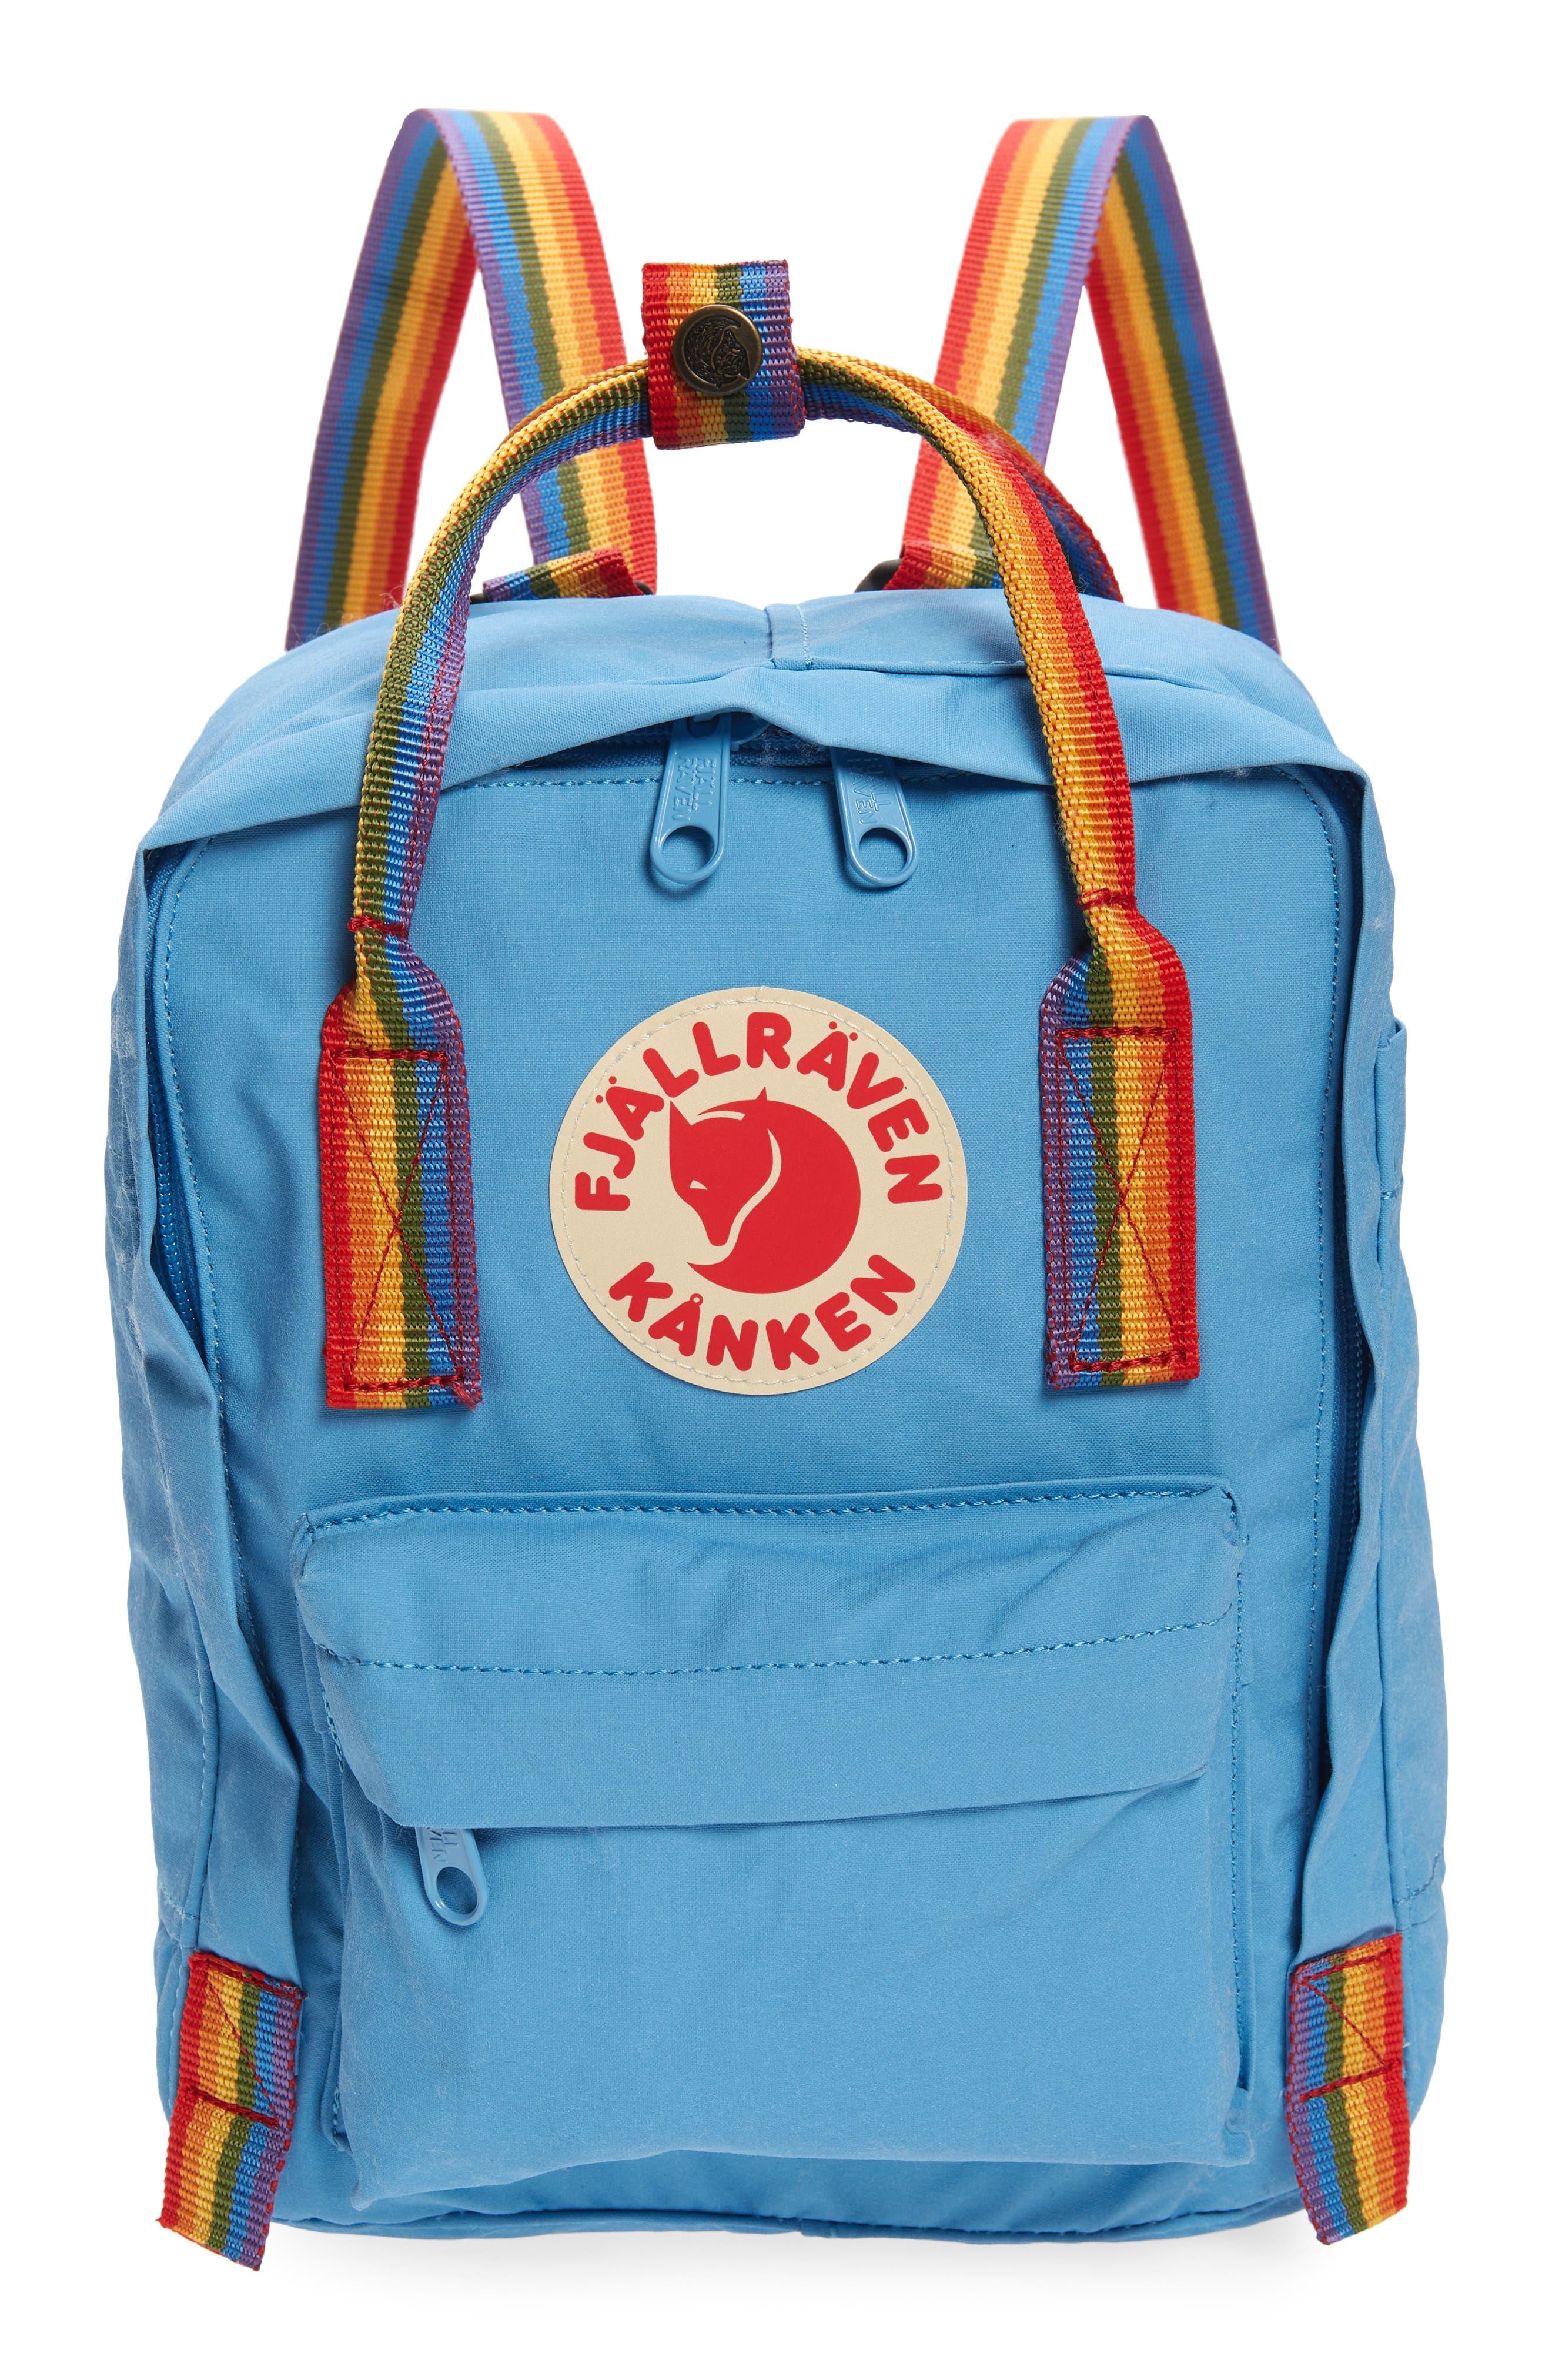 Mini Kanken Rainbow Water Resistant 13-Inch Laptop Backpack